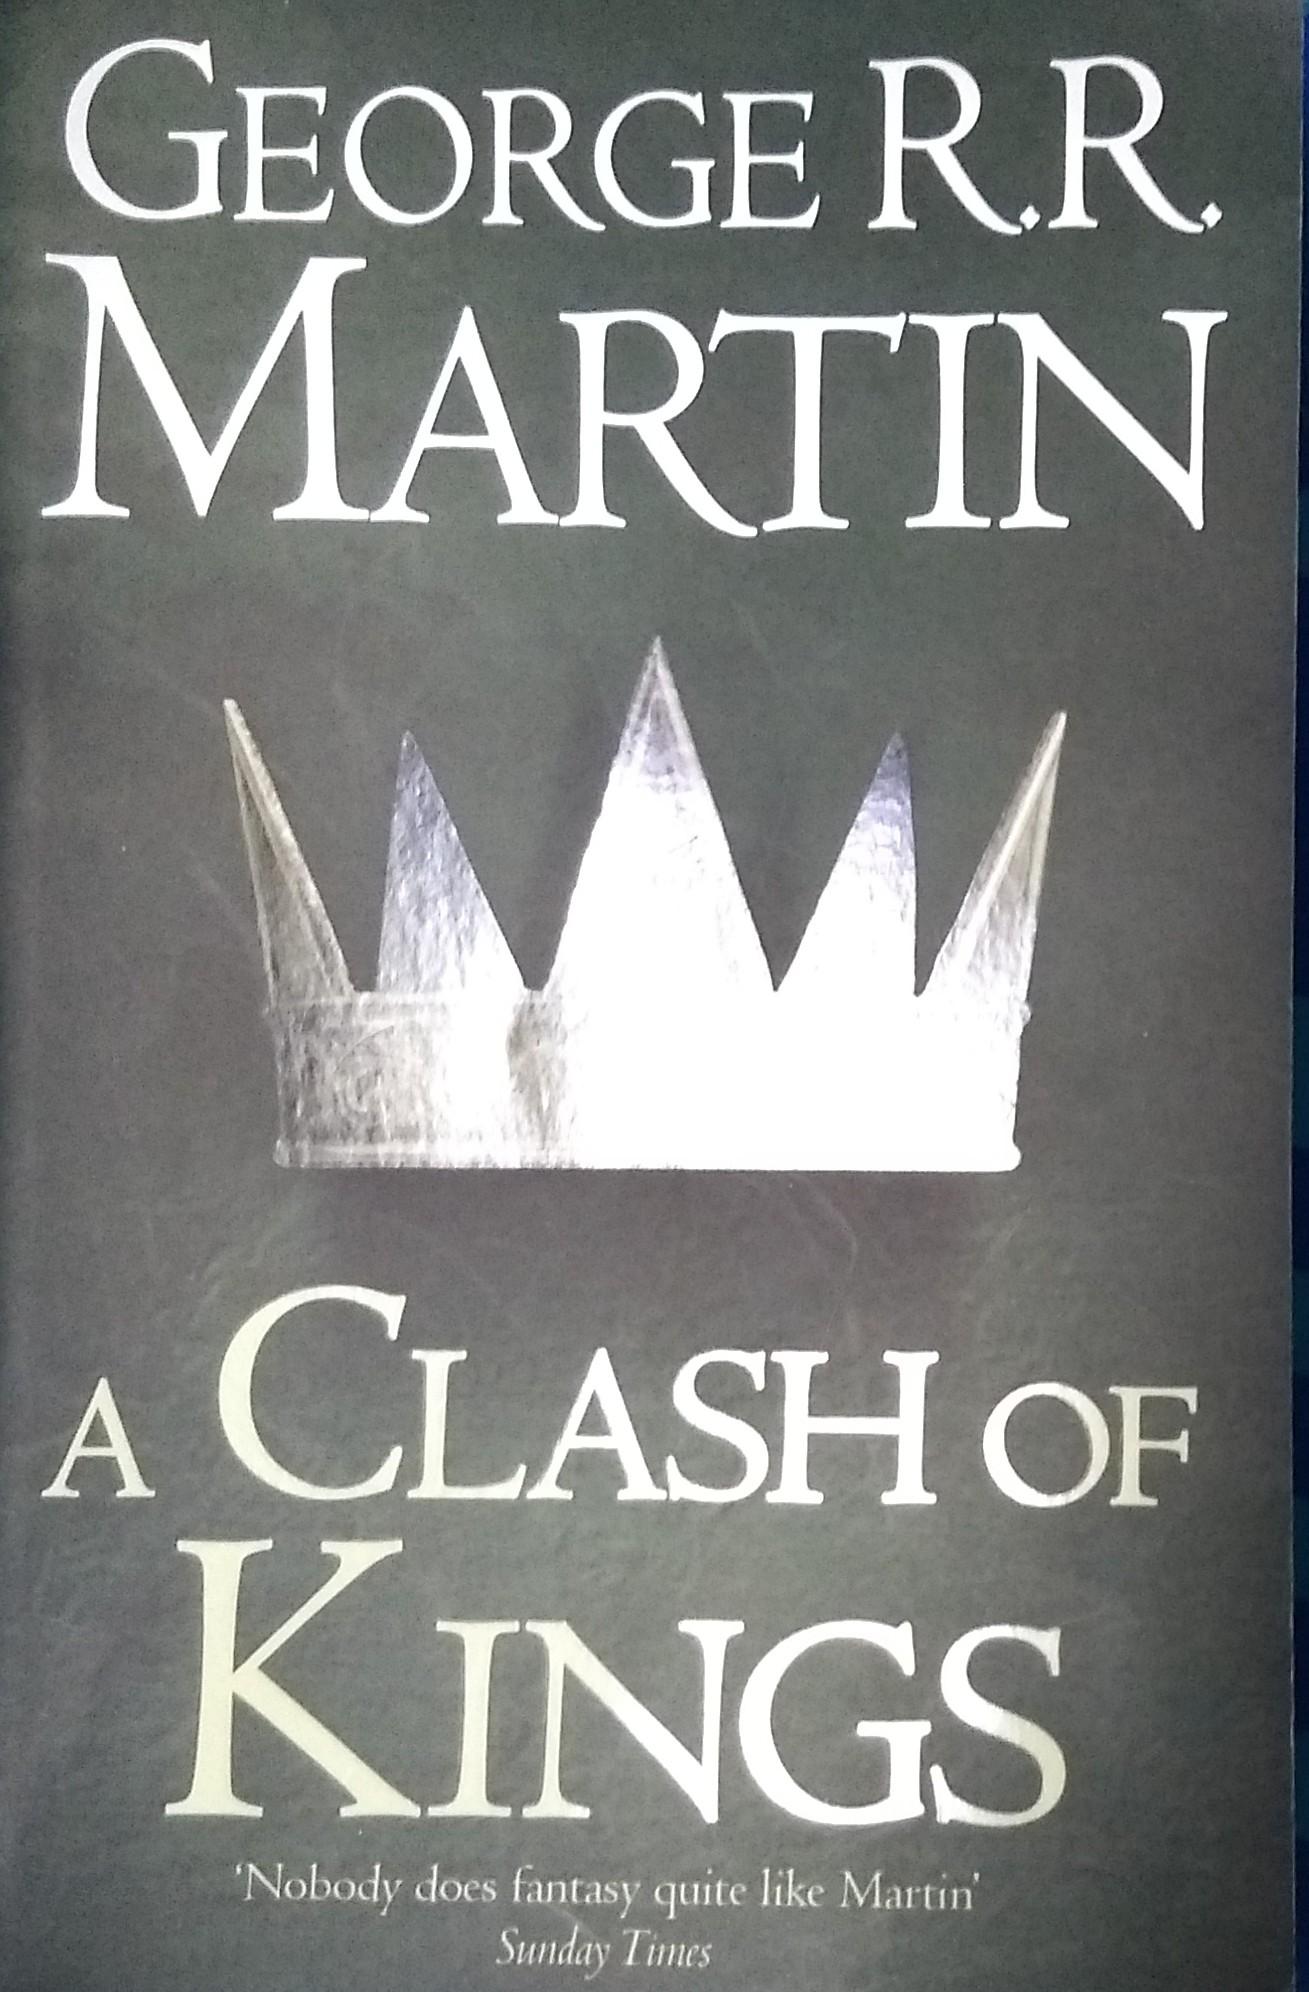 Clash of Kings, George R R Martin